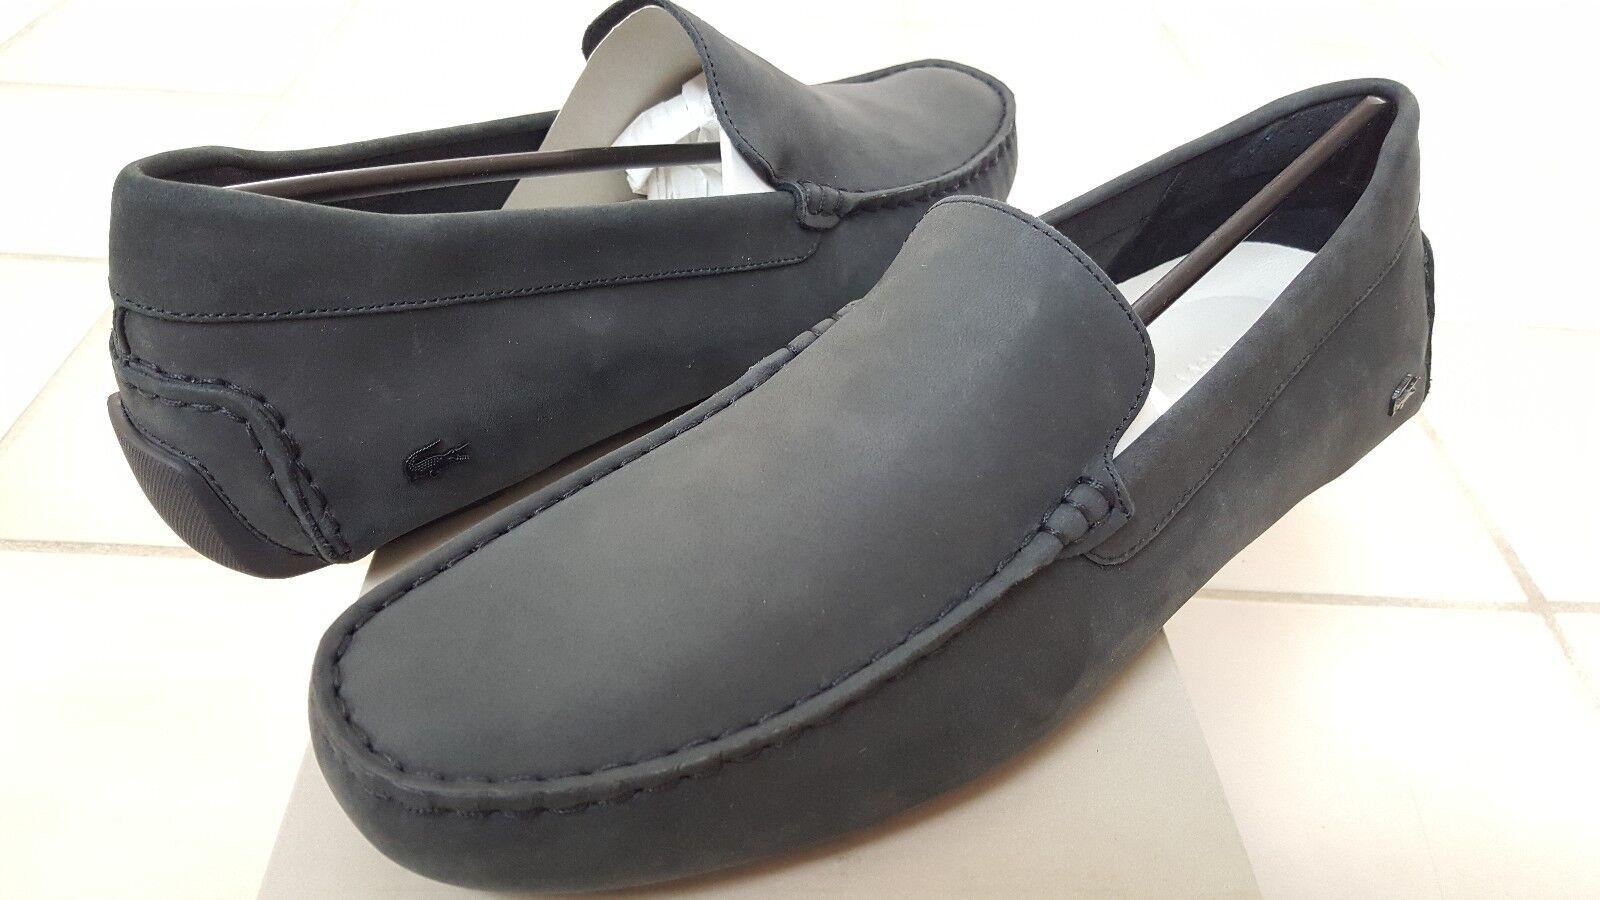 959370746e0843 Lacoste 0784 Mens Piloter 316 Black Nubucke Loafers Shoes 11 Medium ...